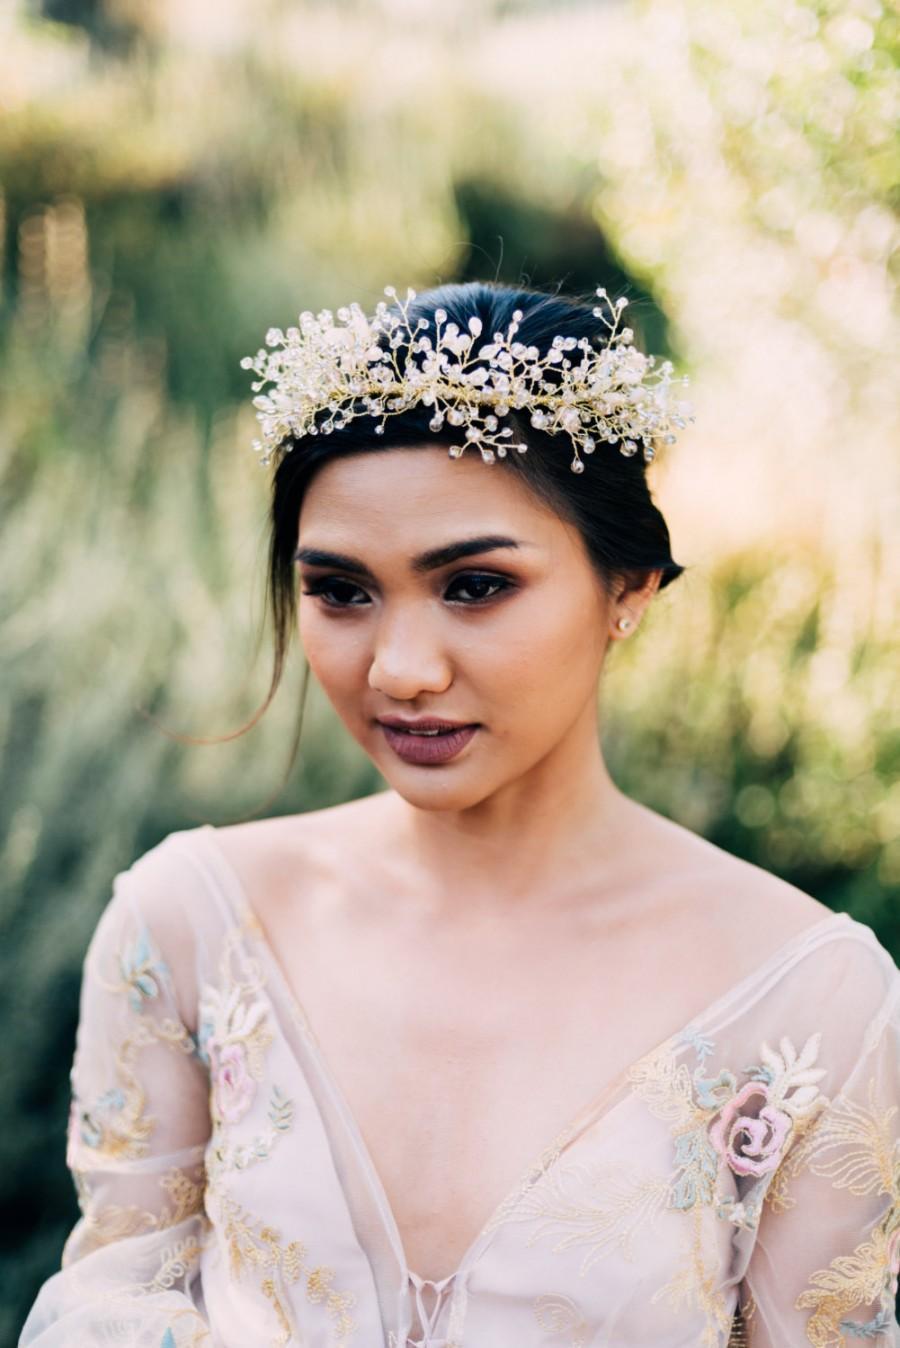 Mariage - Bridal Headpiece, Flower Crown, Wedding Headpiece, Wedding Crown, Beaded Crown, Wedding Hair Vine, Beaded Headpiece, Halo-Style 304- Ariella